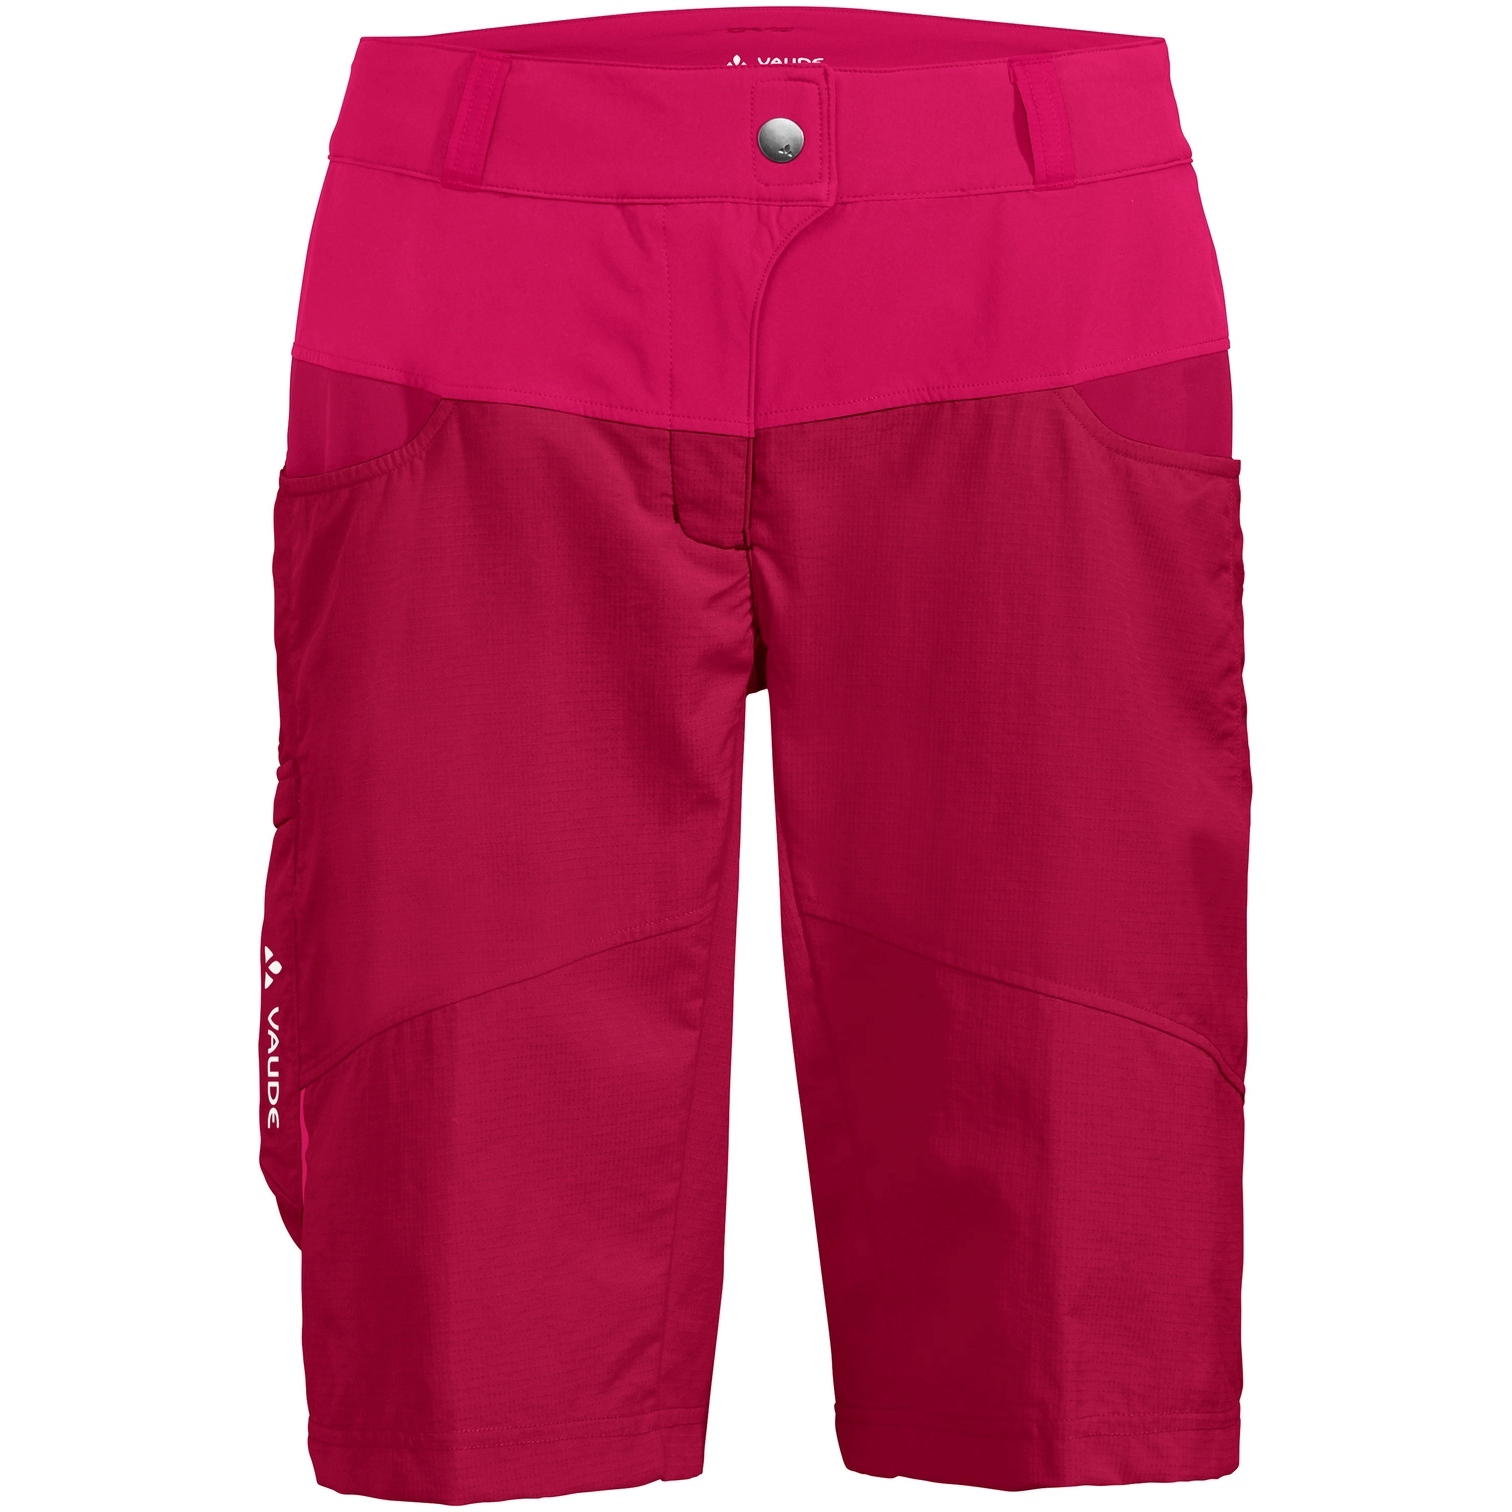 Vaude Qimsa Damen-Shorts - crimson red